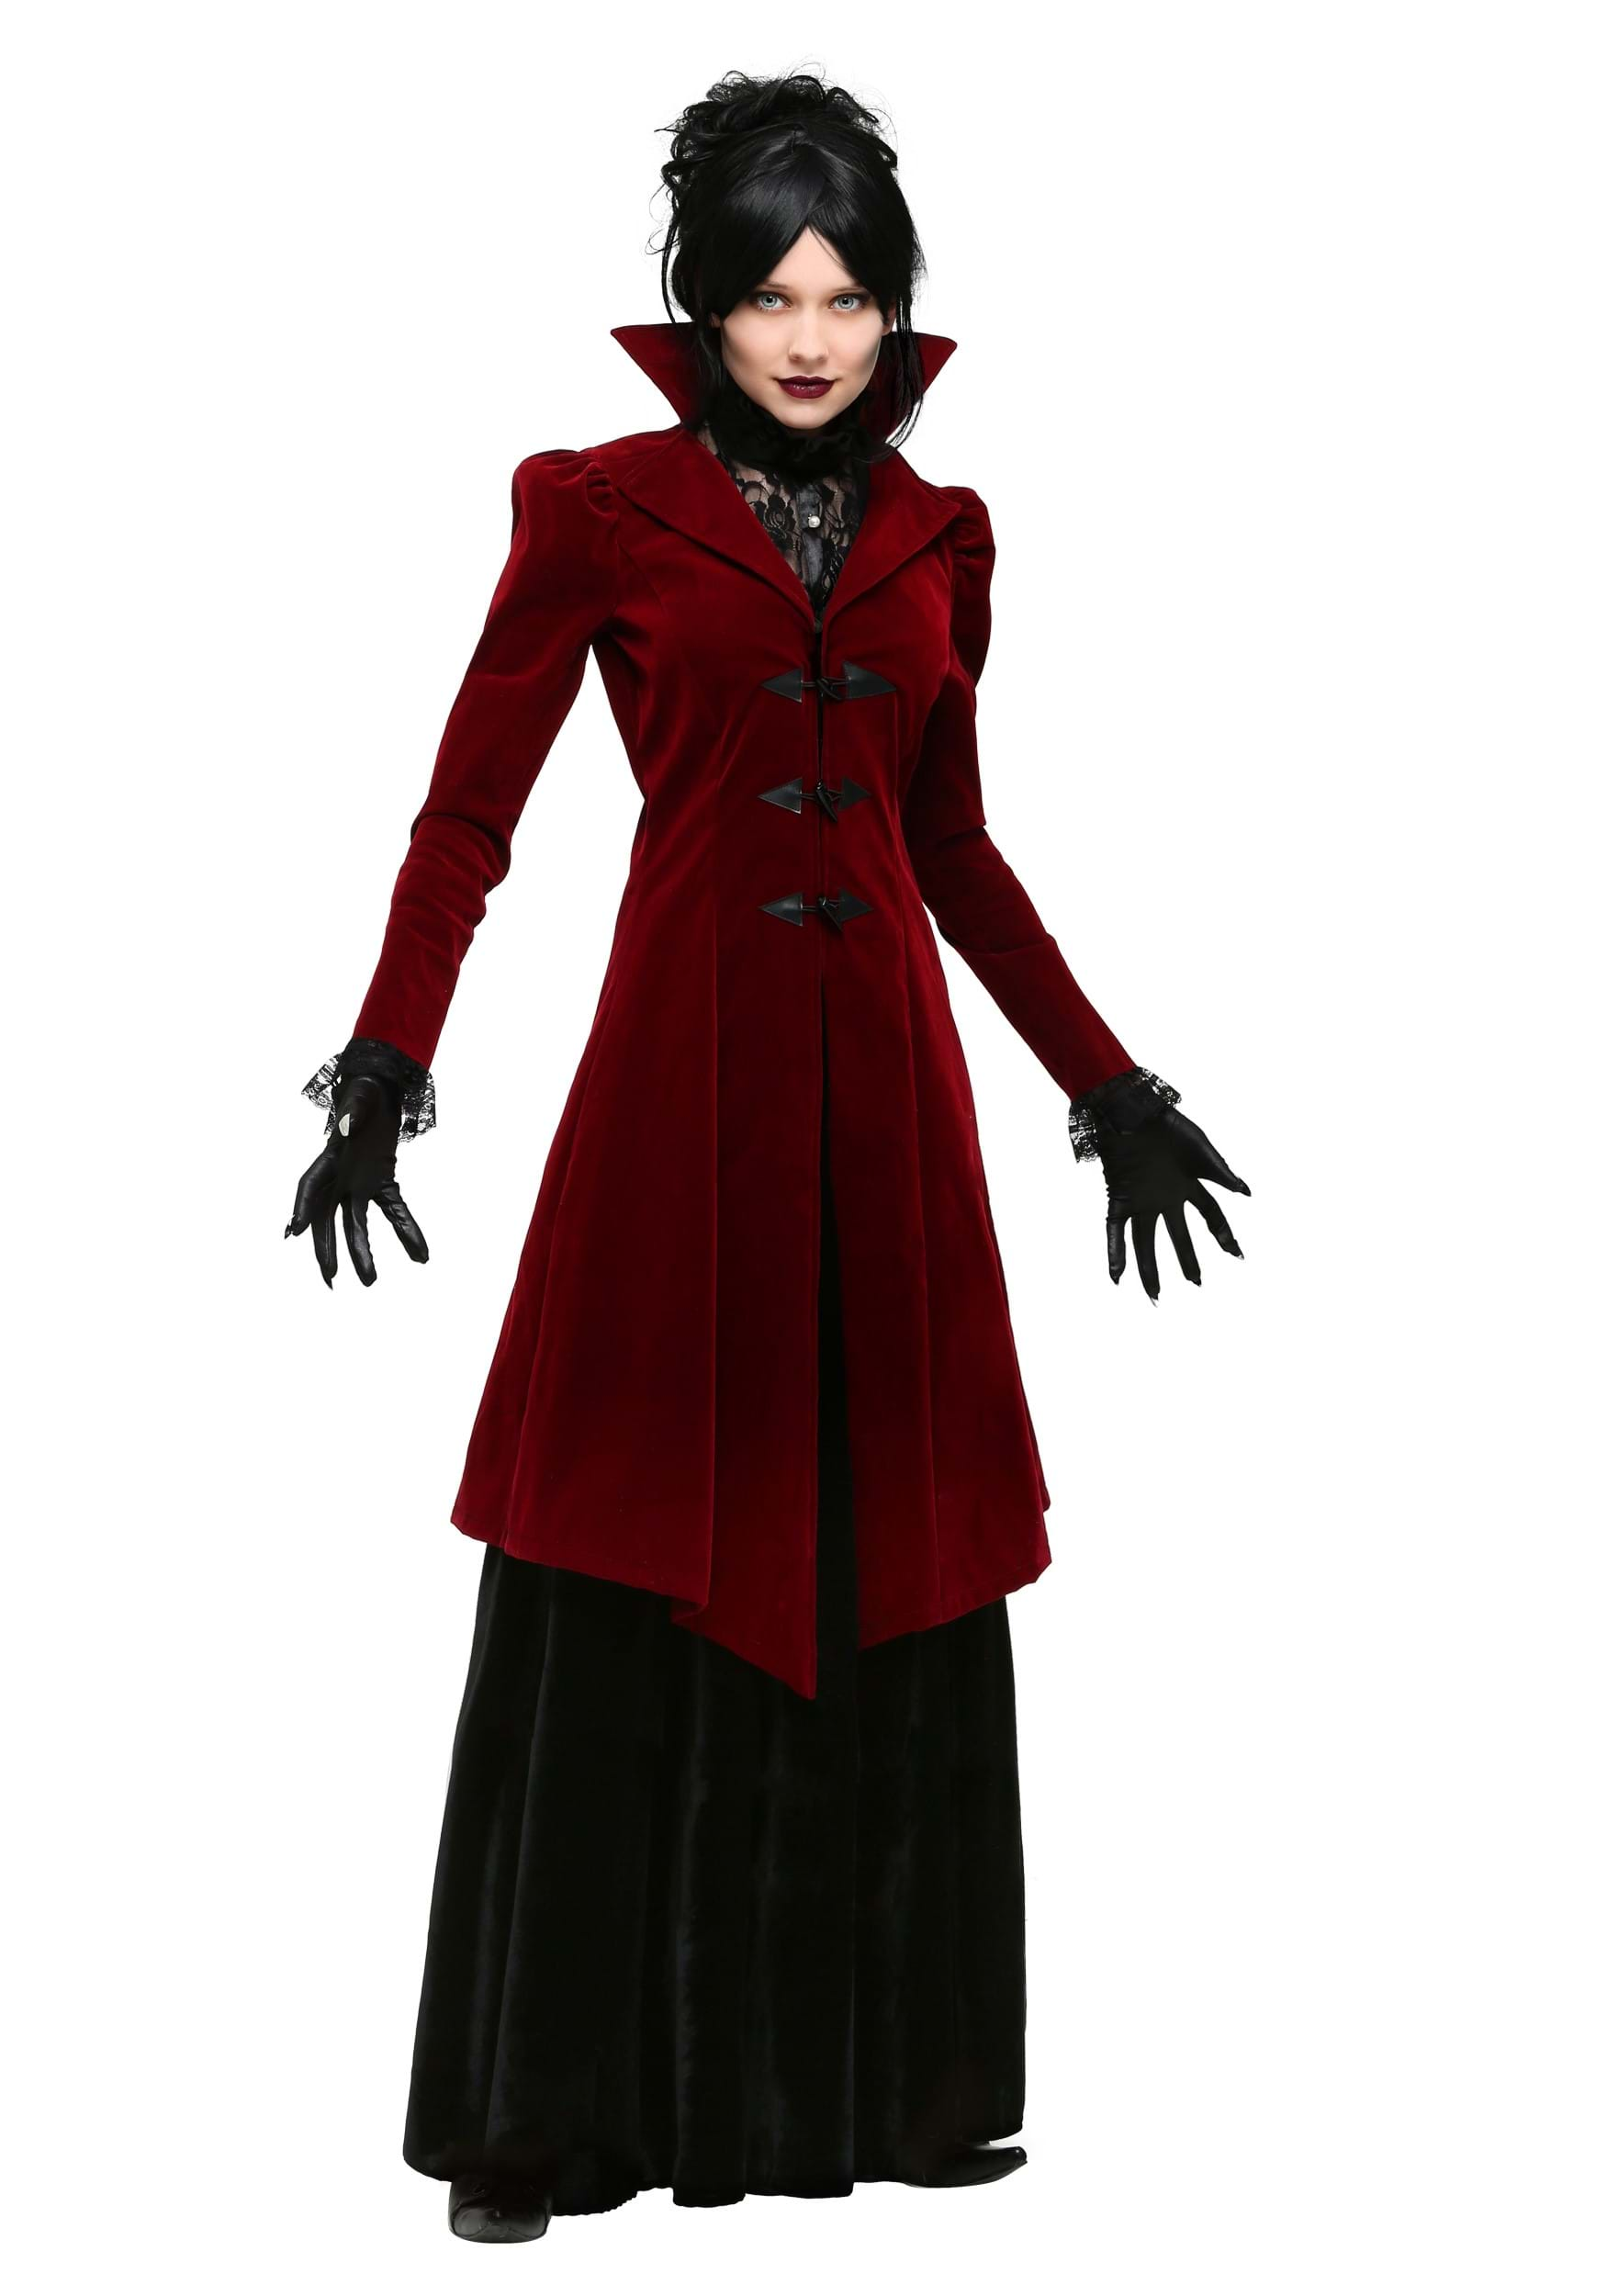 Women S Voodoo Vixen Martini Embroidered Cardigan Retro: Women's Delightfully Dreadful Vampiress Costume